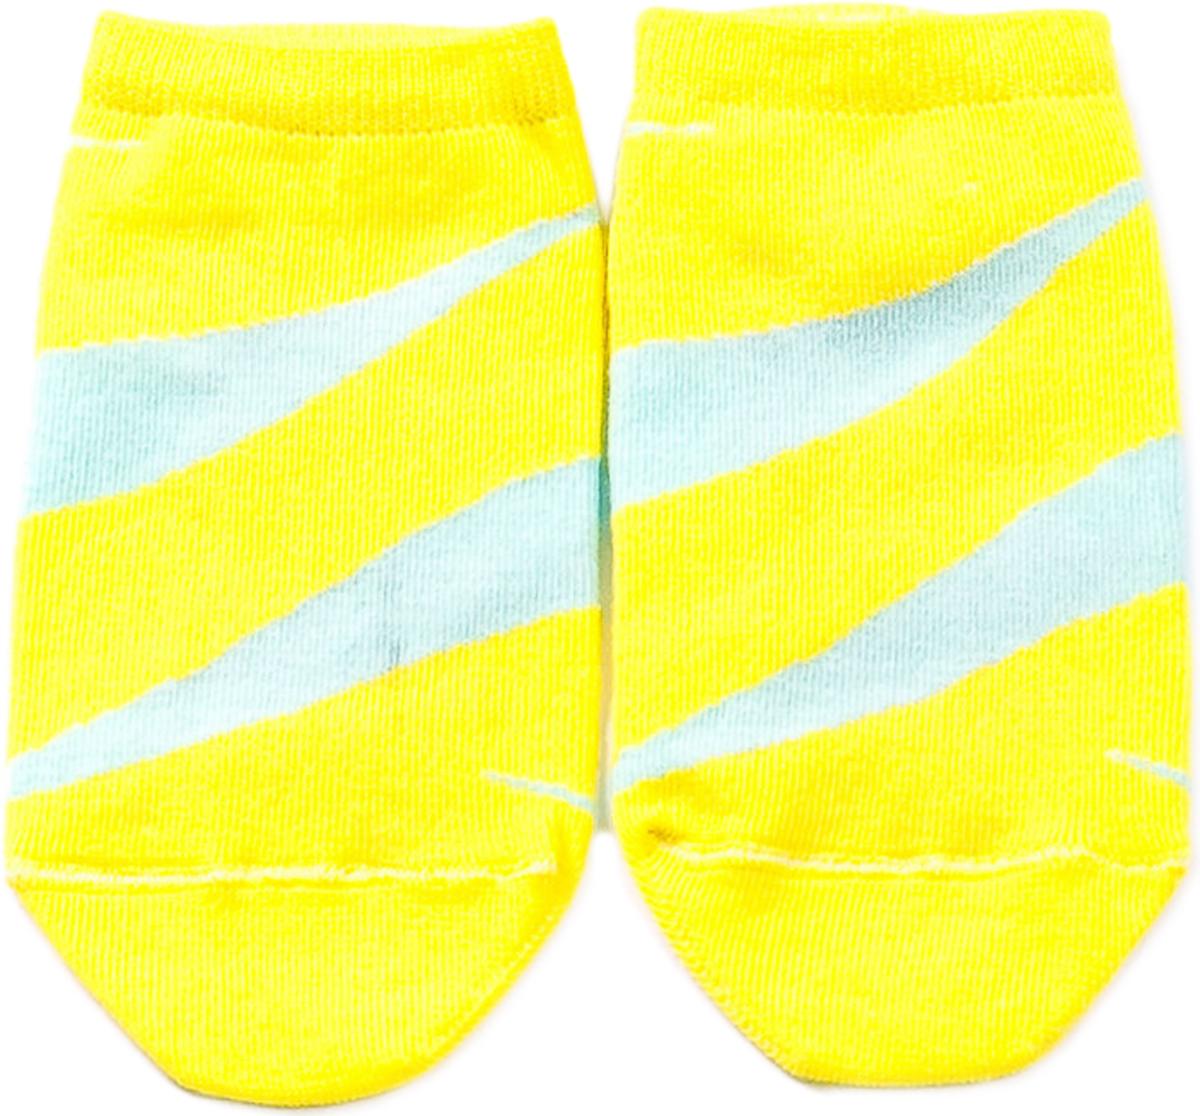 Носки женские Mark Formelle, цвет: лимонный. 306K-446. Размер 36/37306K-446